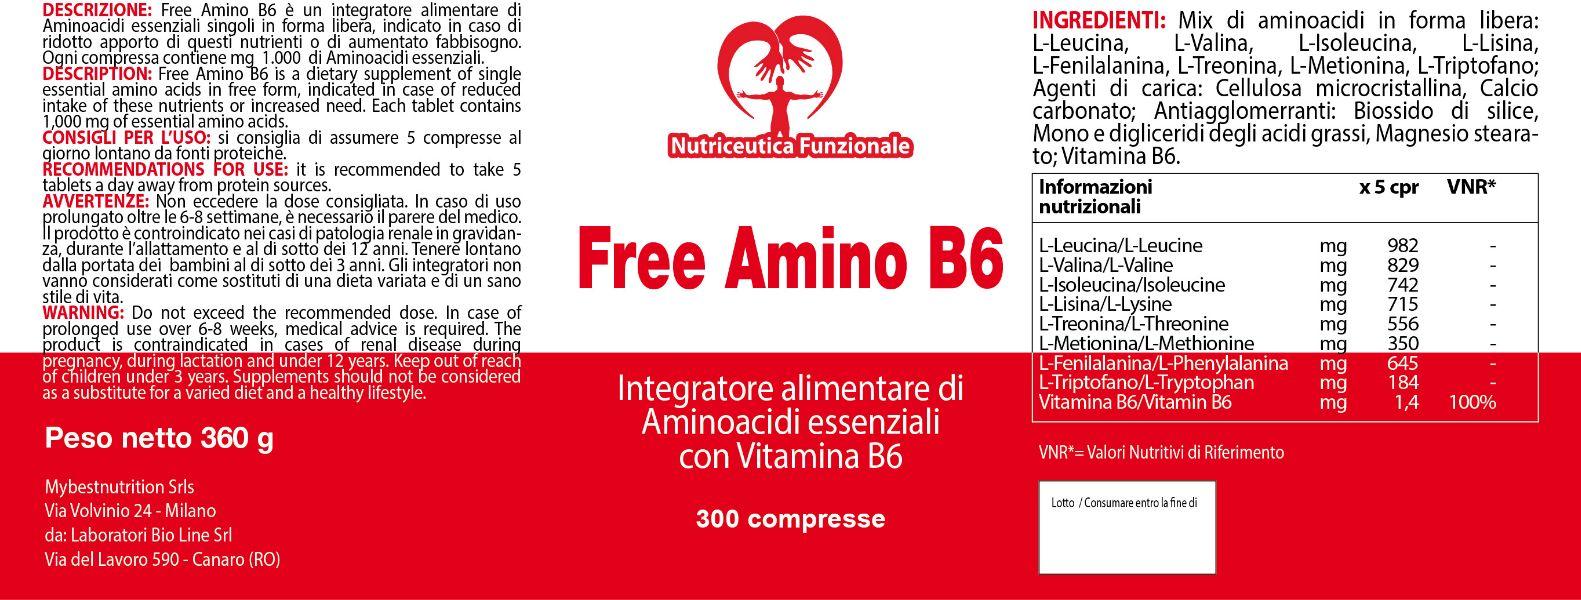 Free-Amino-B6-(300cmp)